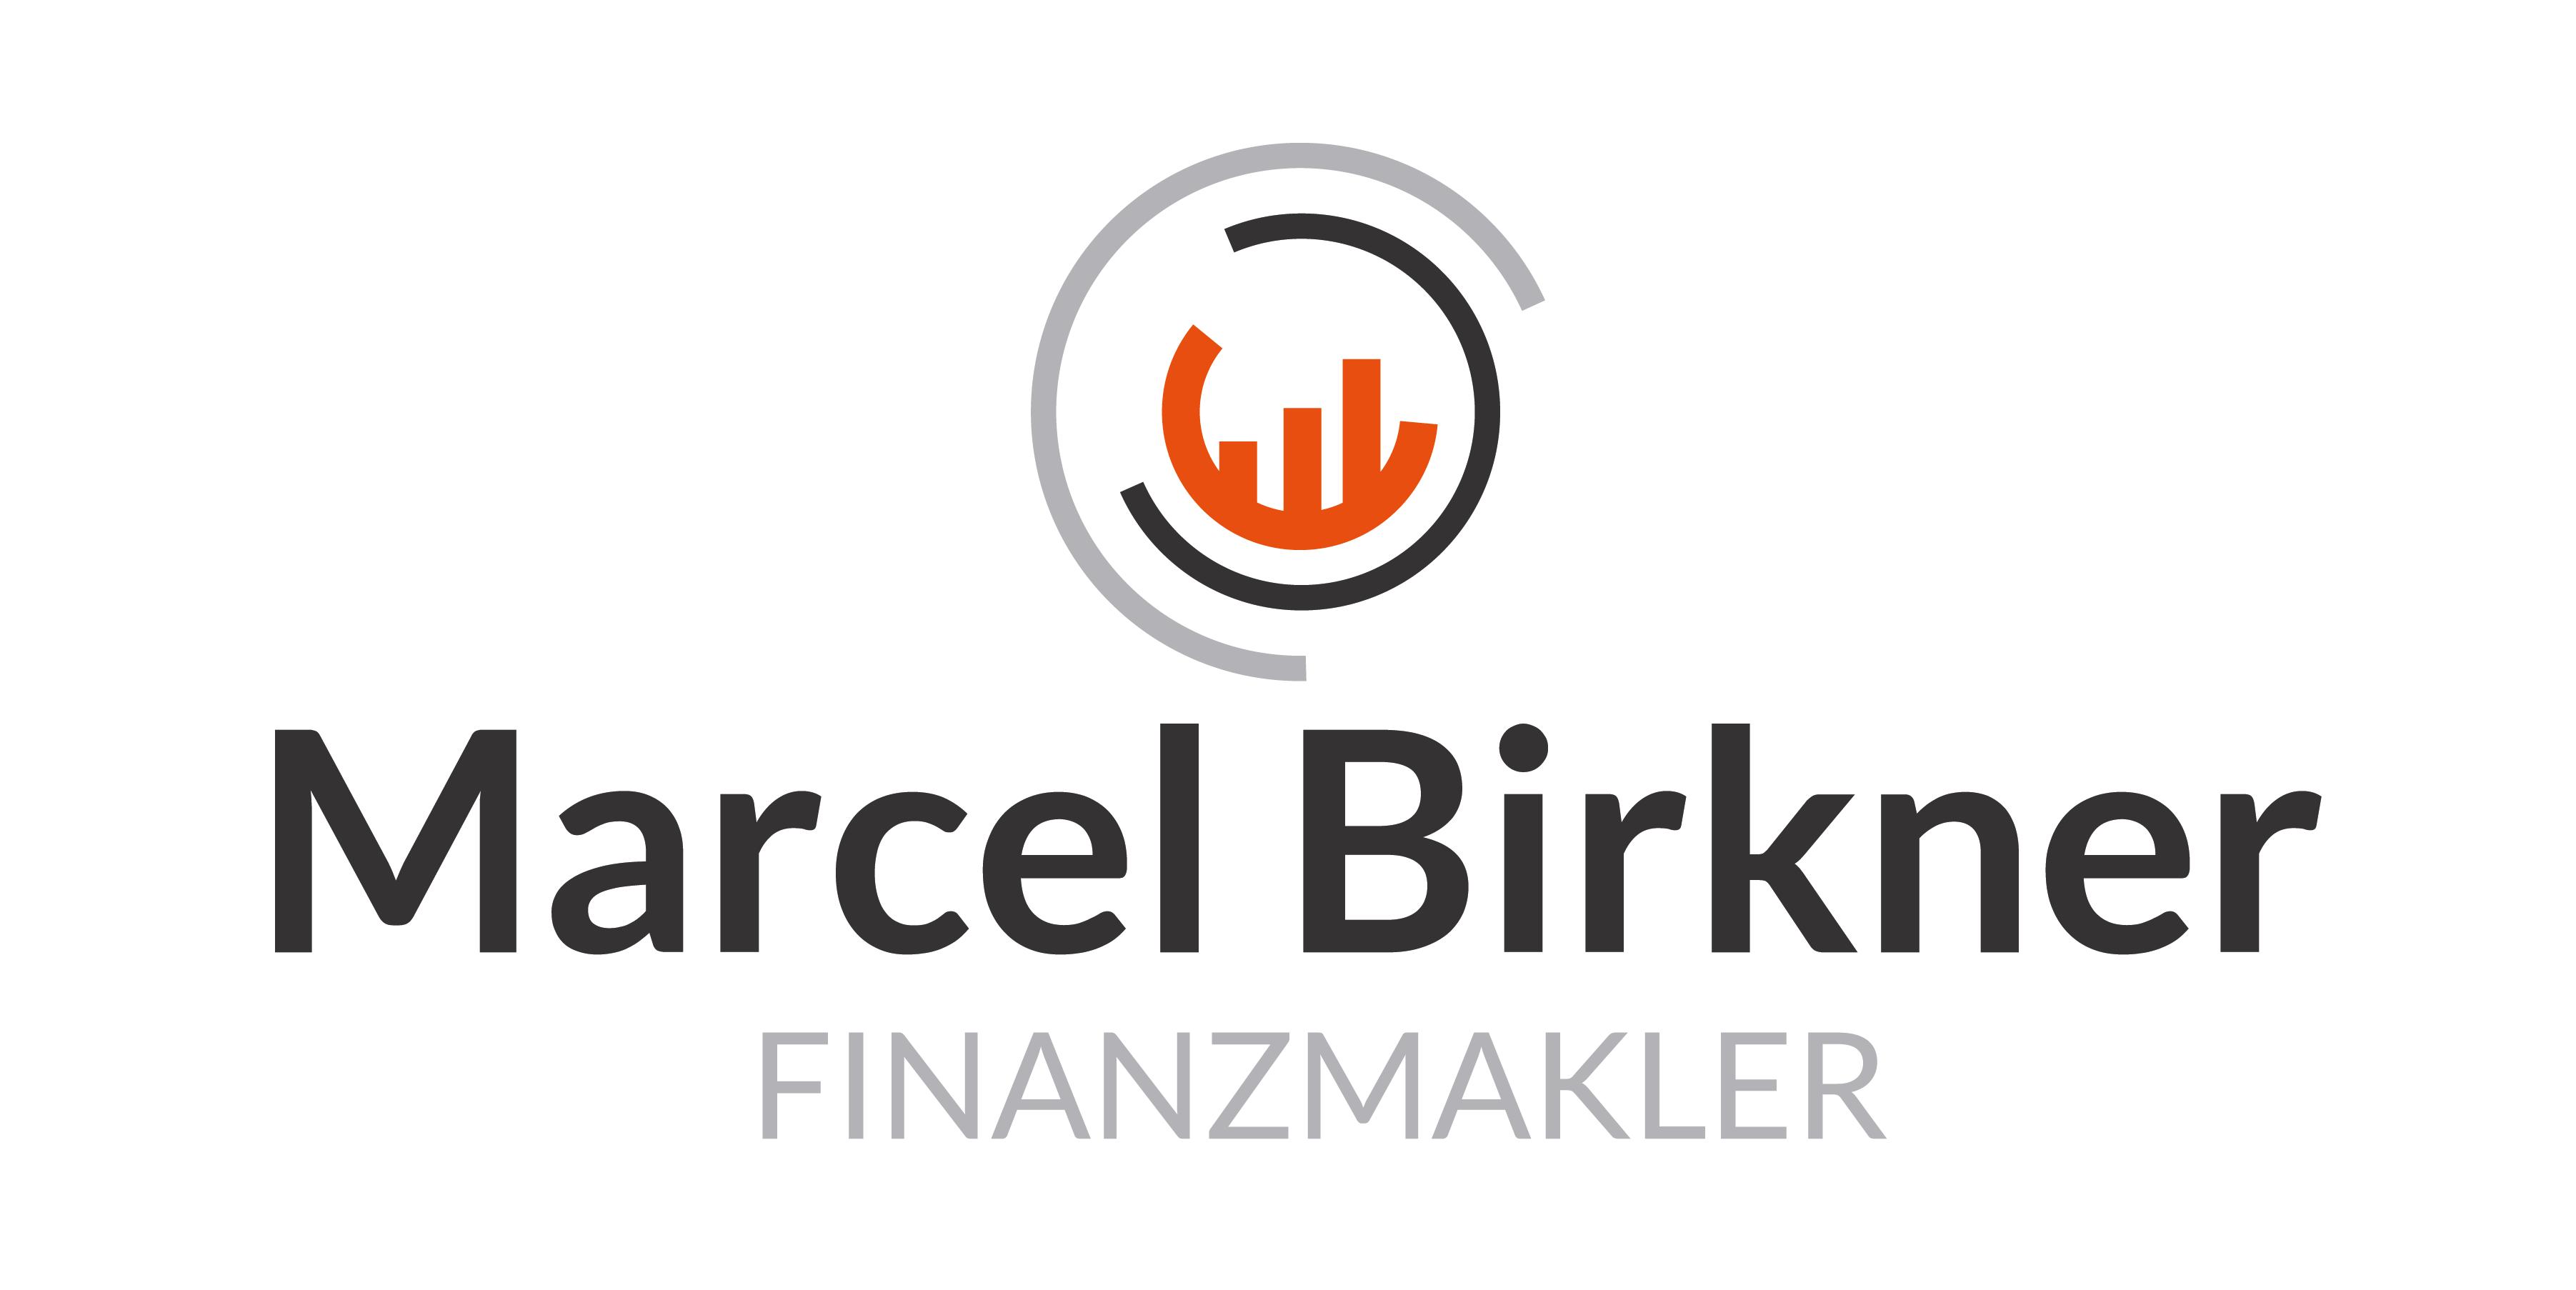 Marcel Birkner